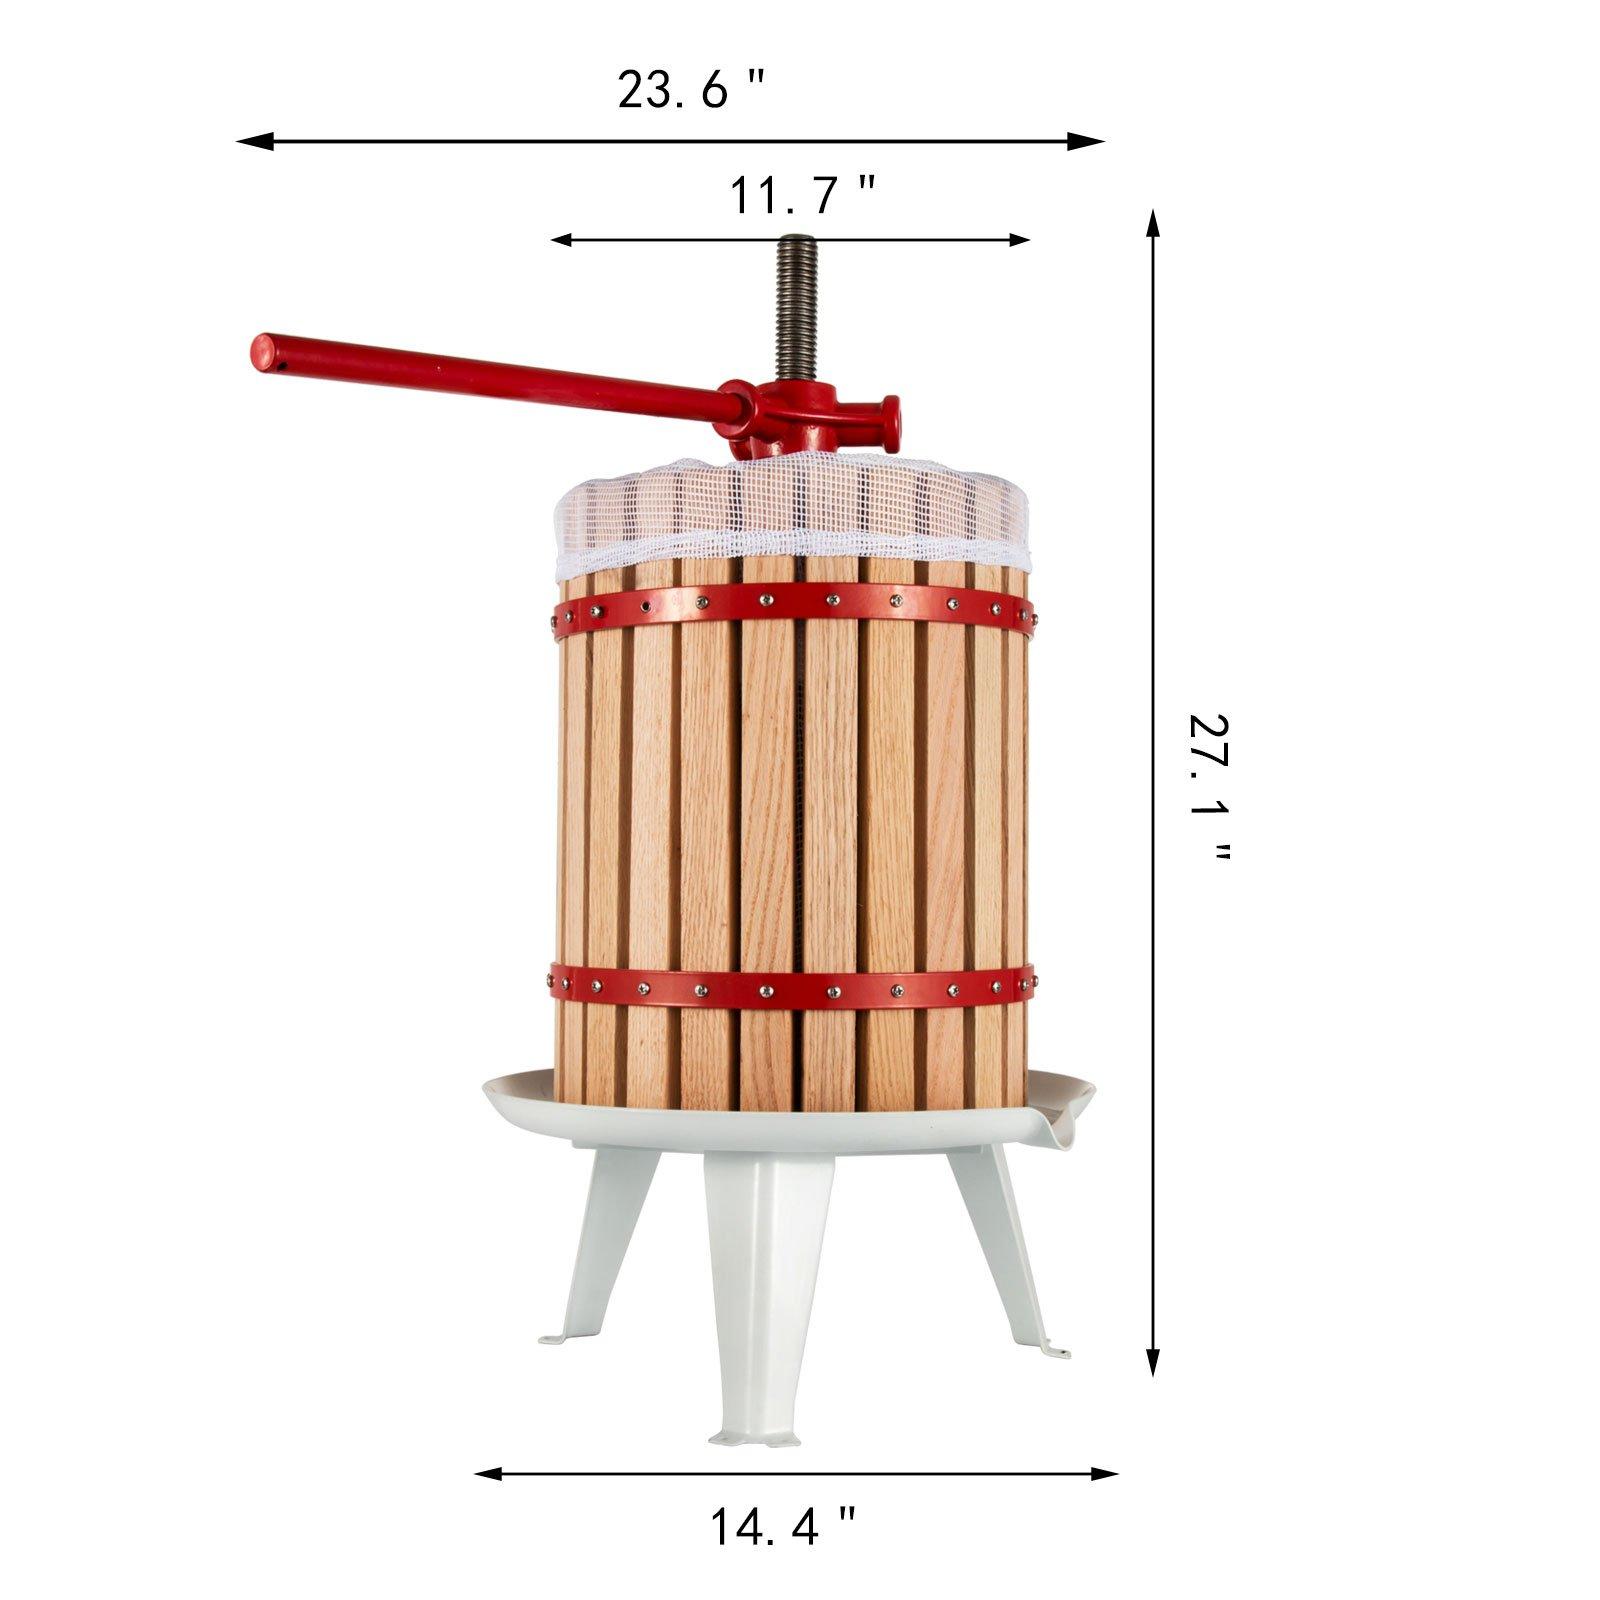 OrangeA 4.7 Gallon Fruit and Wine Press Solid Wood Basket Fruit and Wine Manual Press Press Cider Apple Grape Crusher Juice Maker (4.7 Gallon) by OrangeA (Image #2)